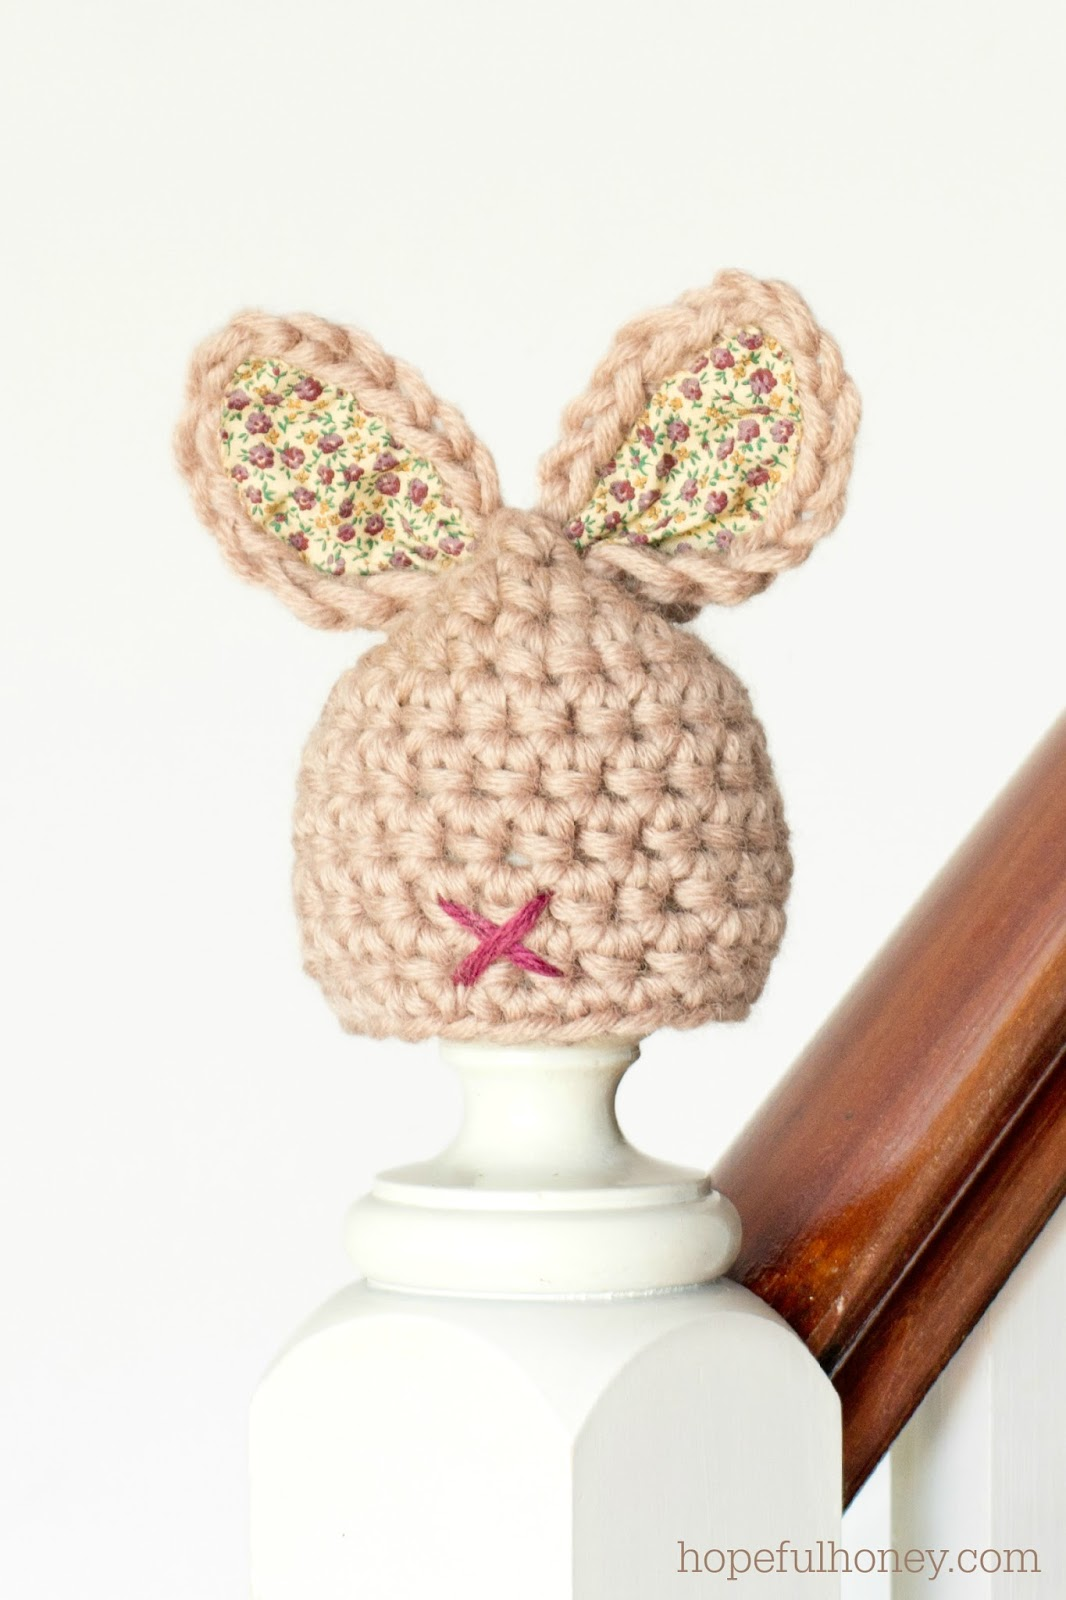 Crochet Bunny Ears Hat Pattern : Hopeful Honey Craft, Crochet, Create: Newborn Bunny Hat ...